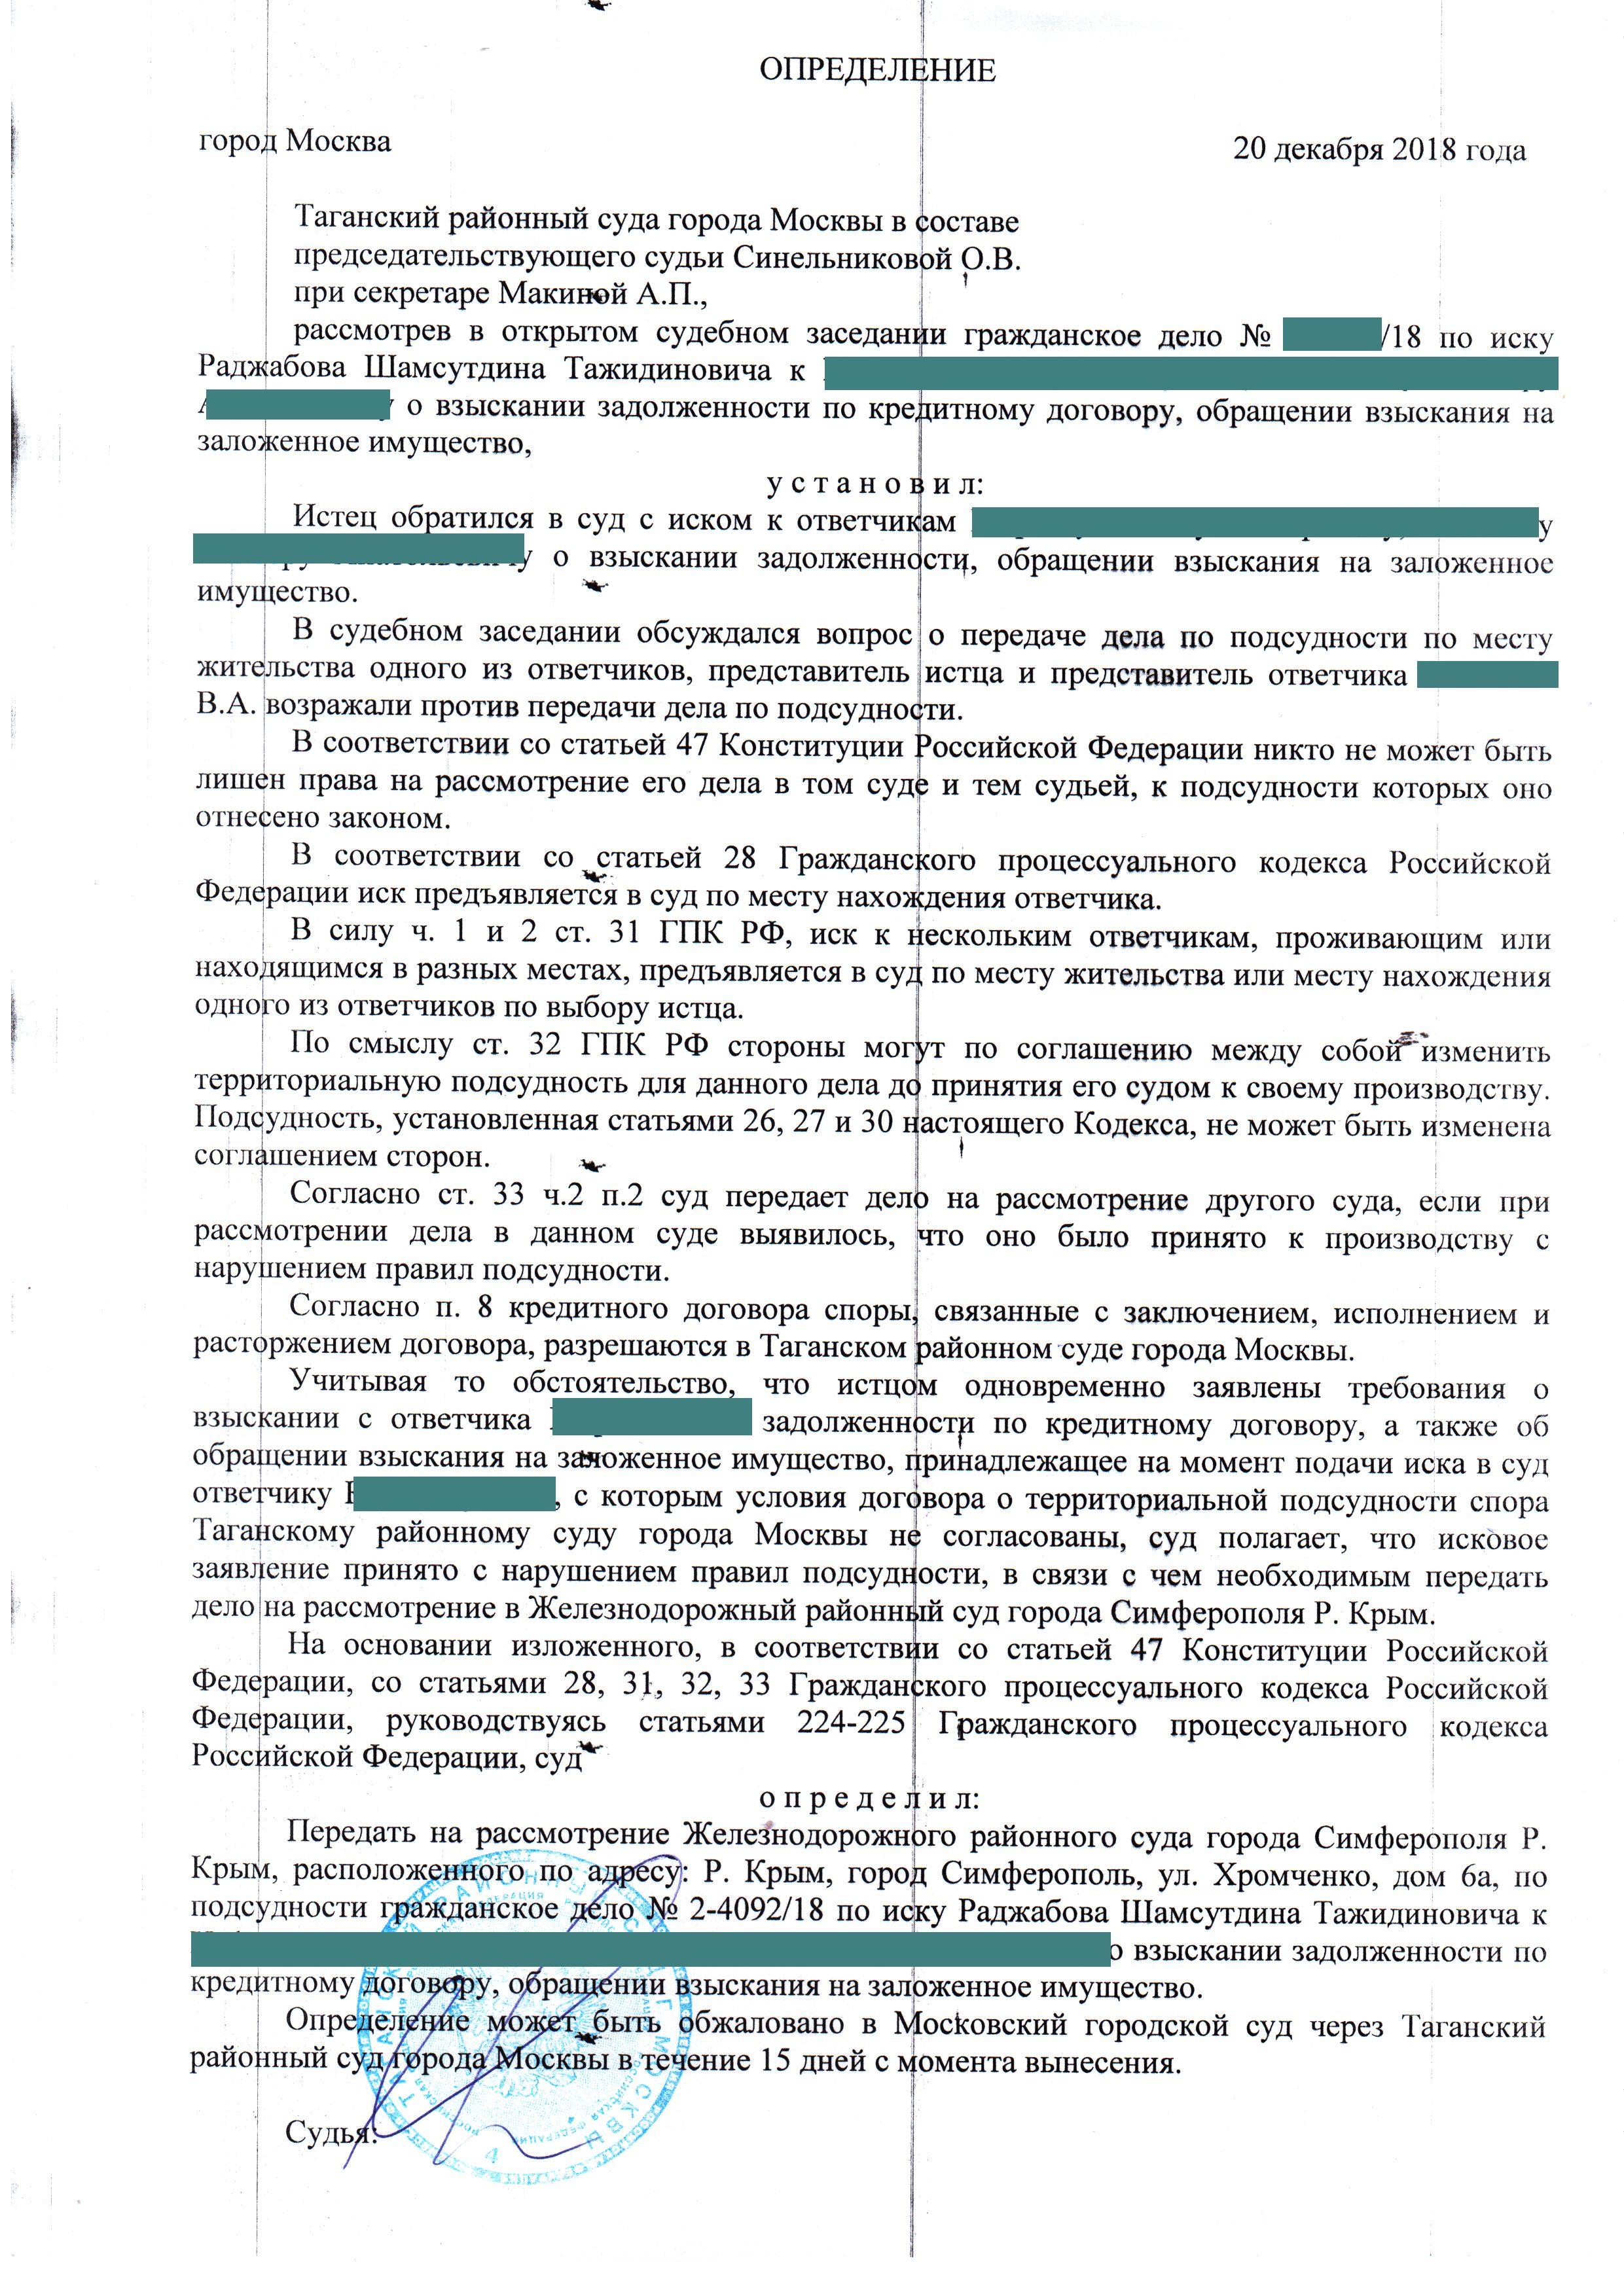 россельхозбанк онлайн заявка на кредит пенсионерам